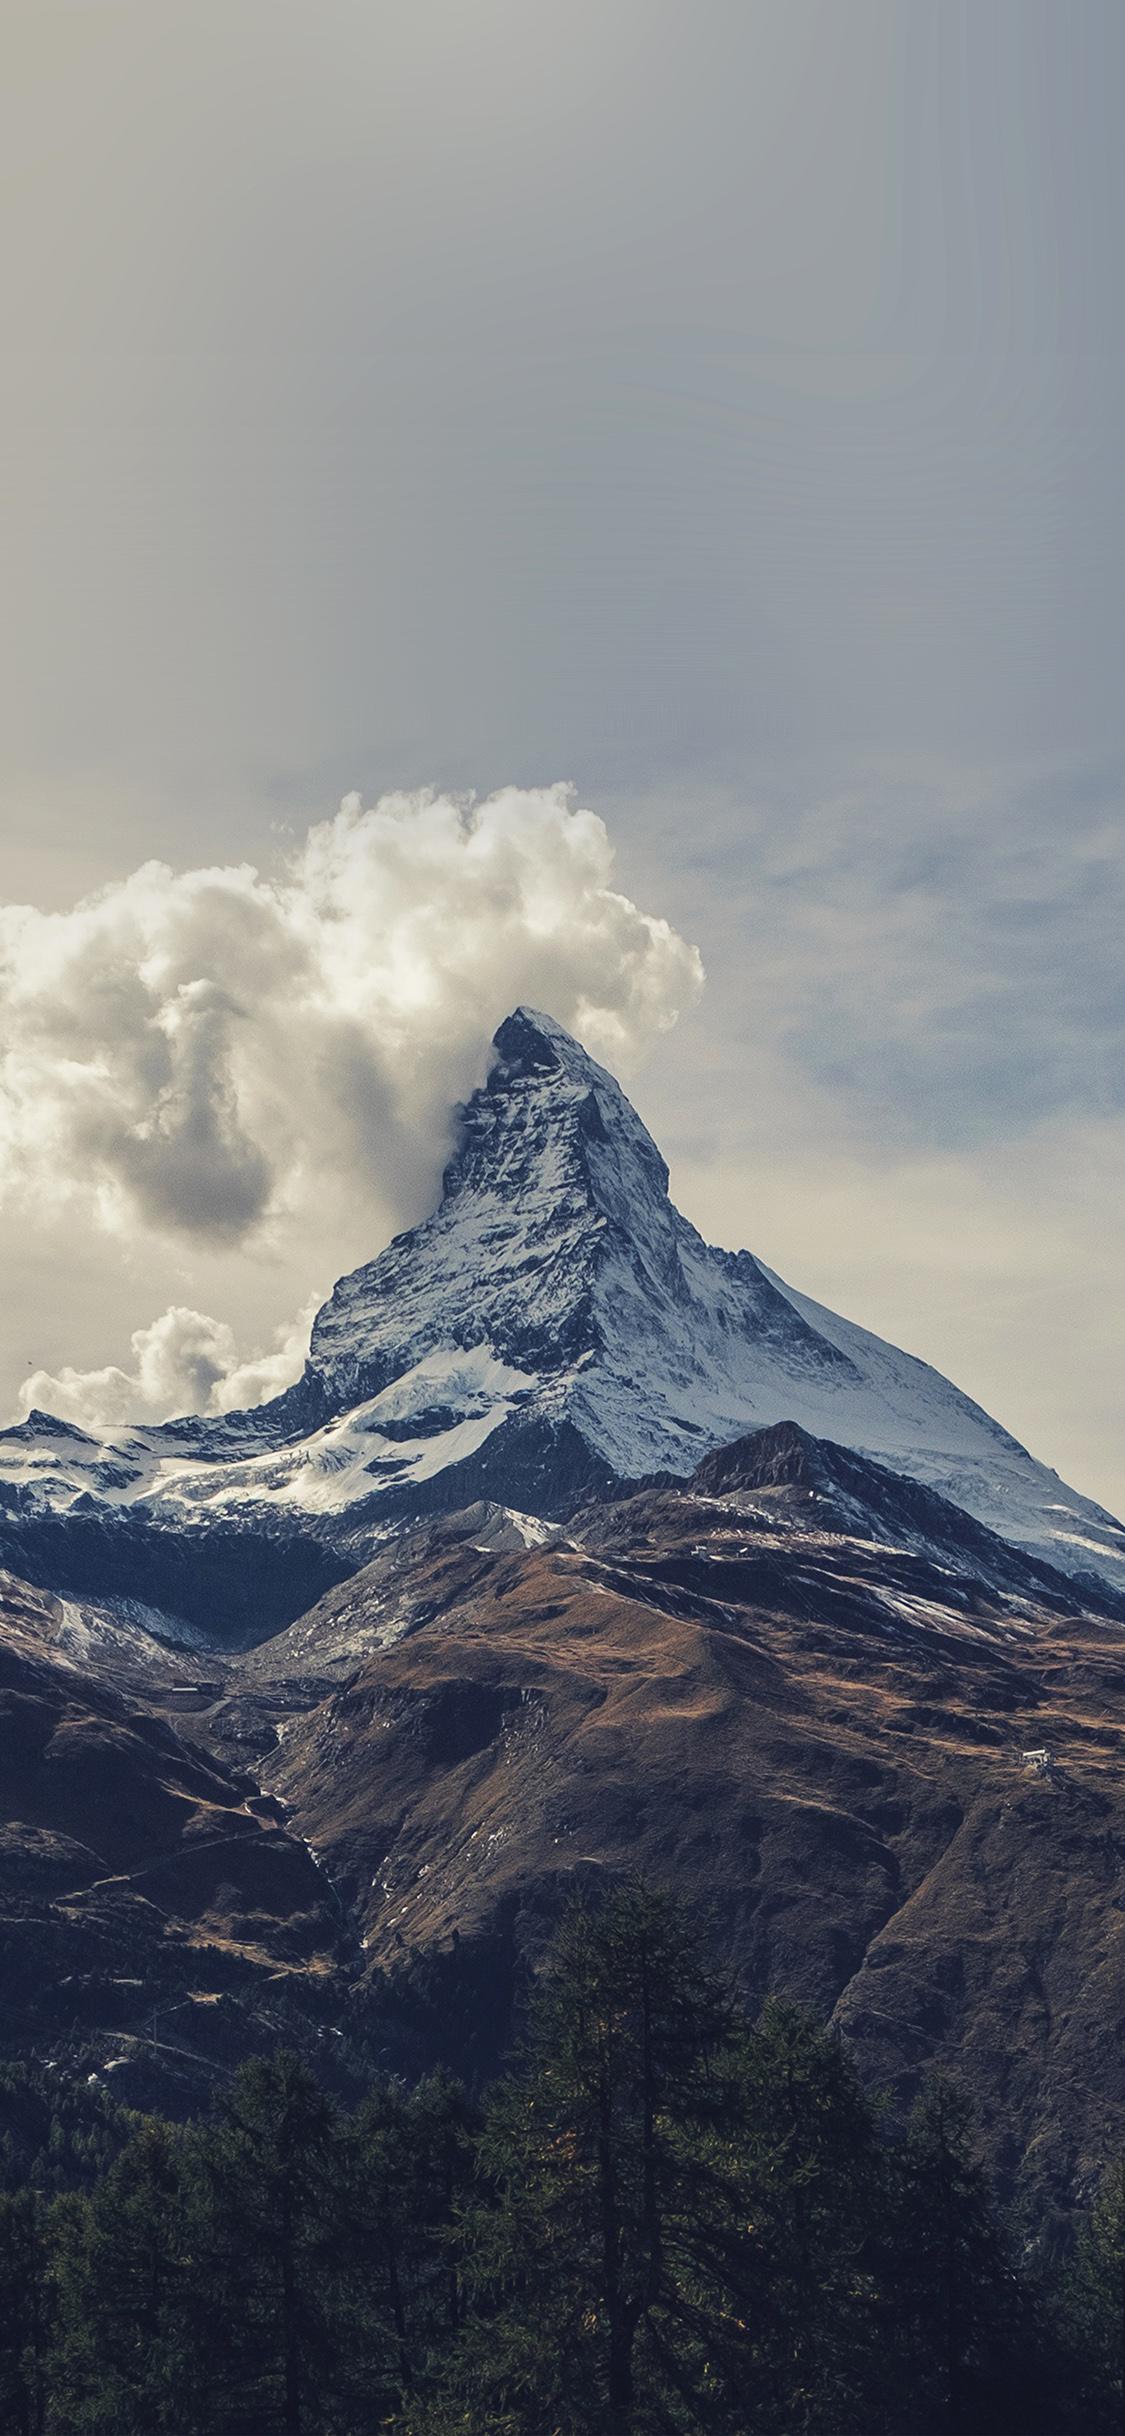 Wonderful Wallpaper Mountain Iphone Se - papers  Image_58713.jpg